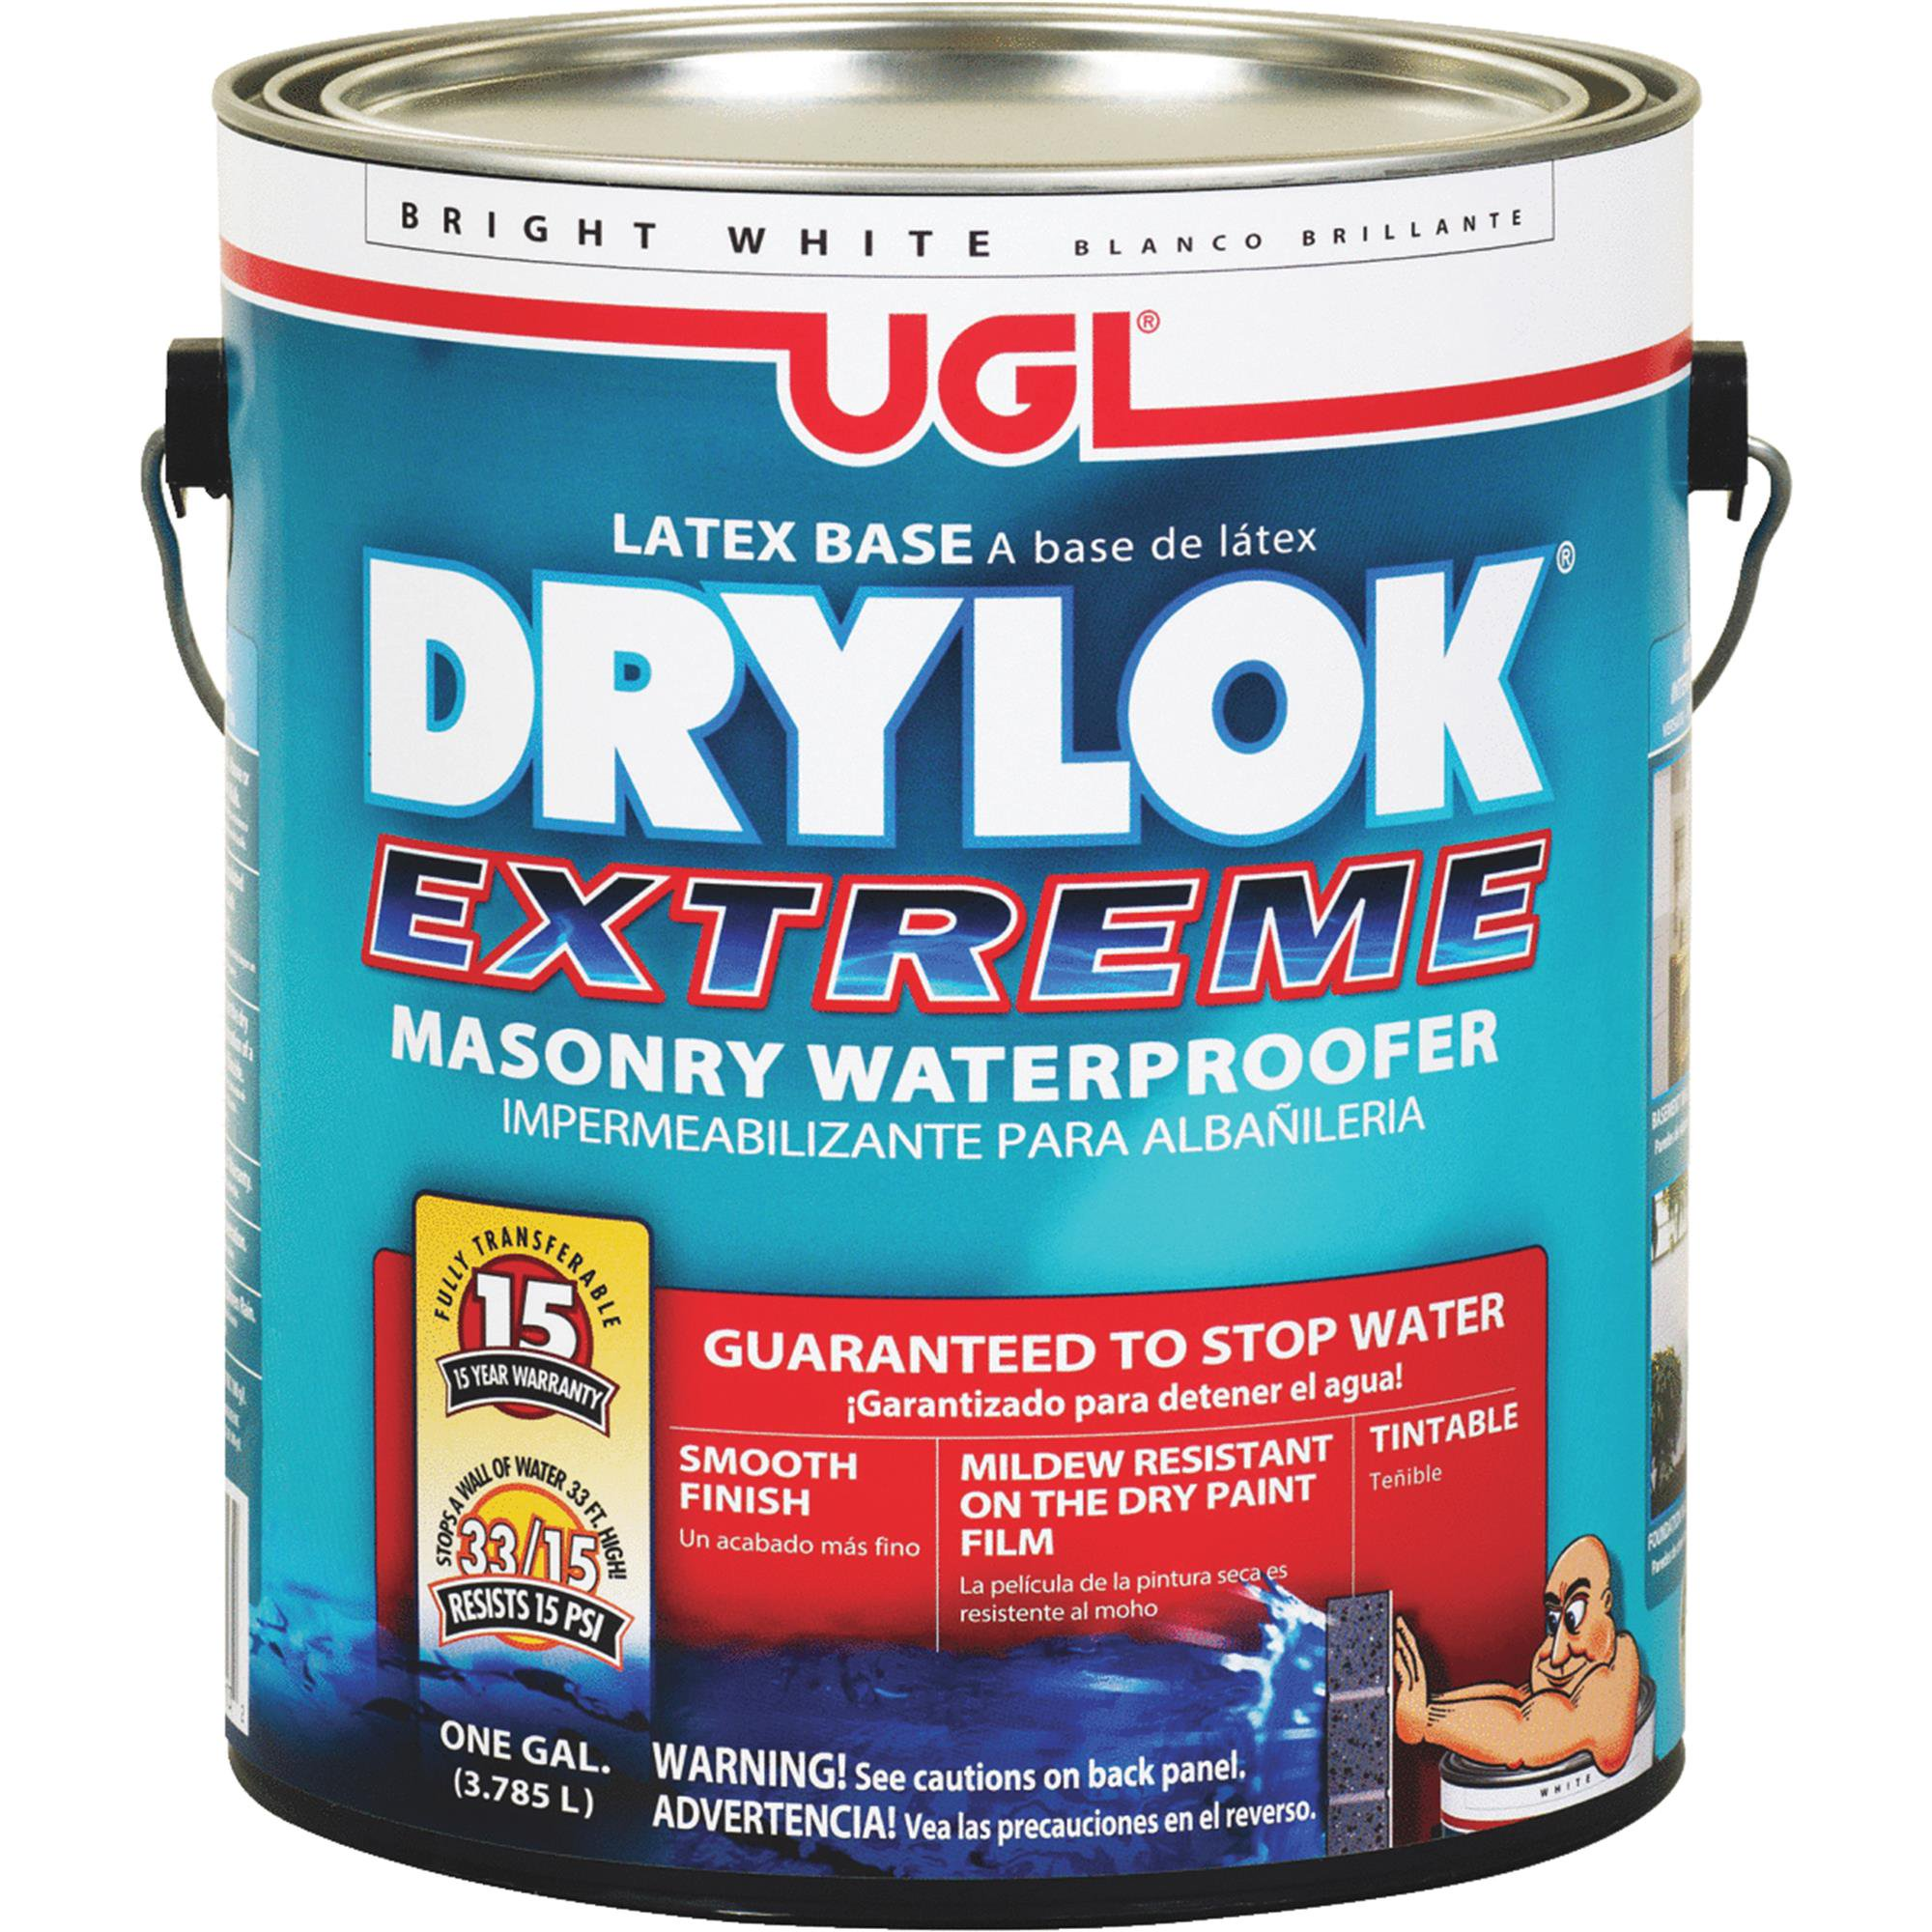 Drylok Extreme Masonry Waterproofer Concrete Sealer by United Gilsonite Lab